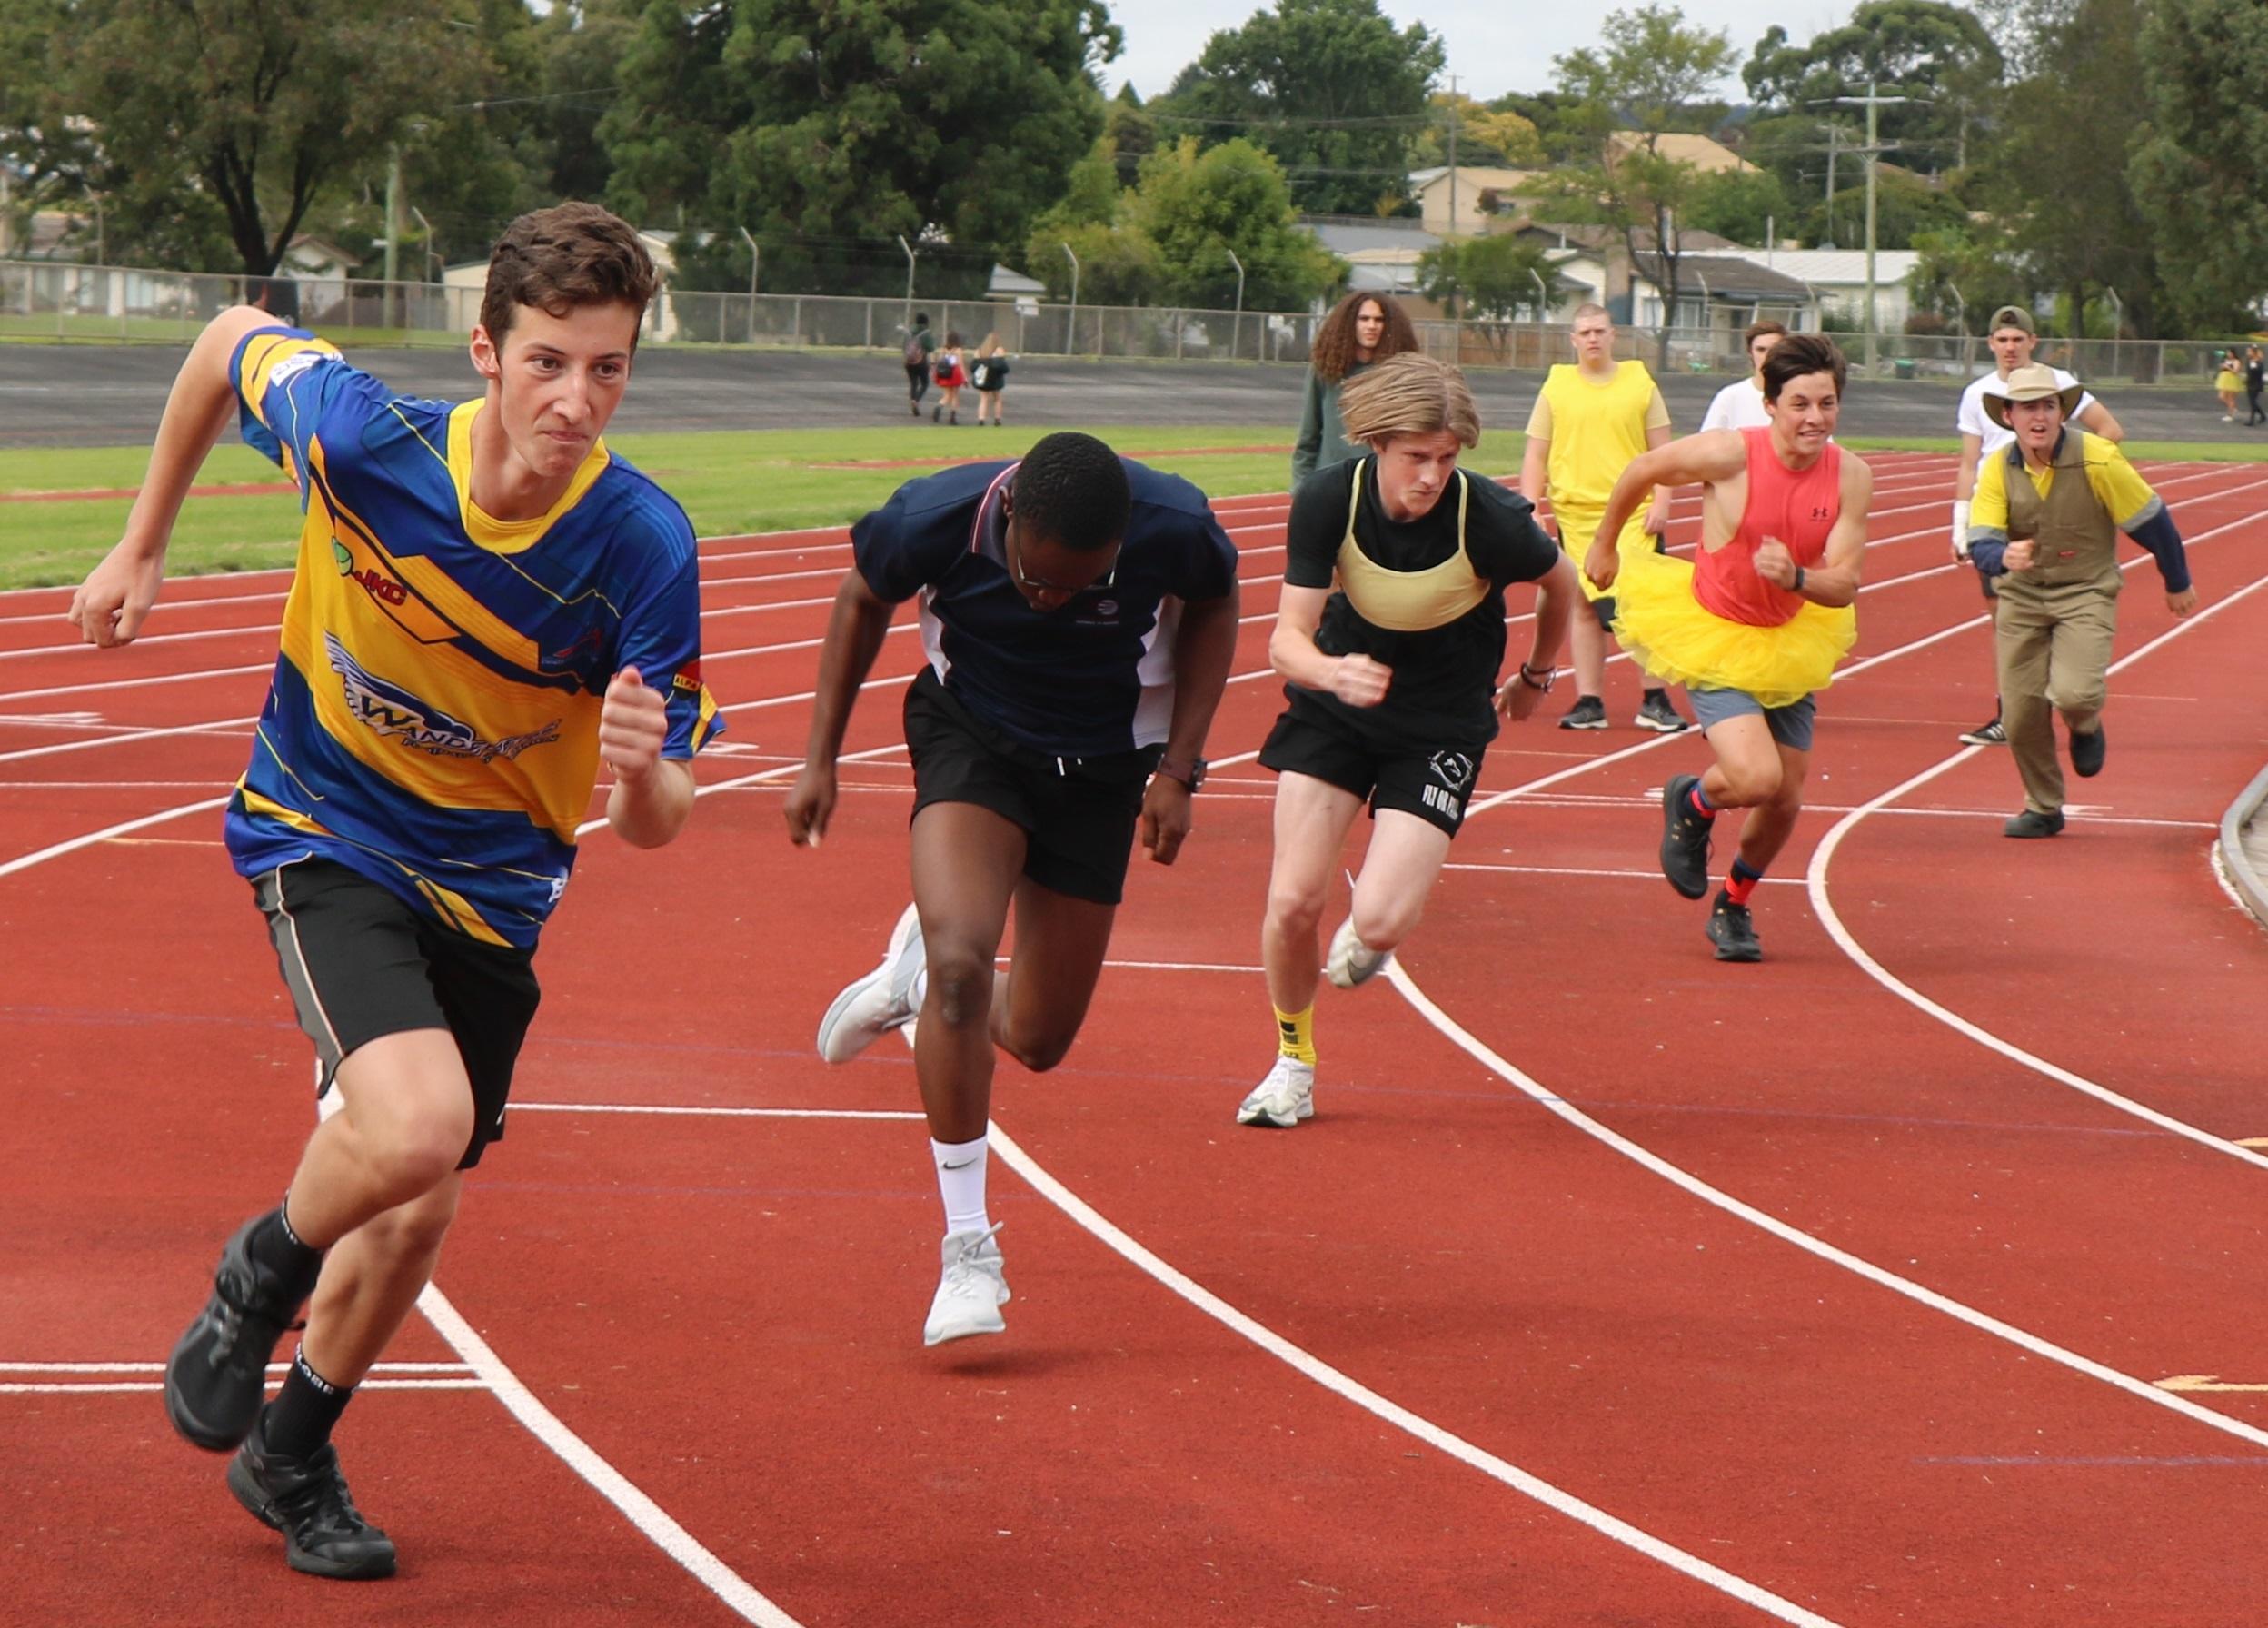 Inter-house Athletics Carnival